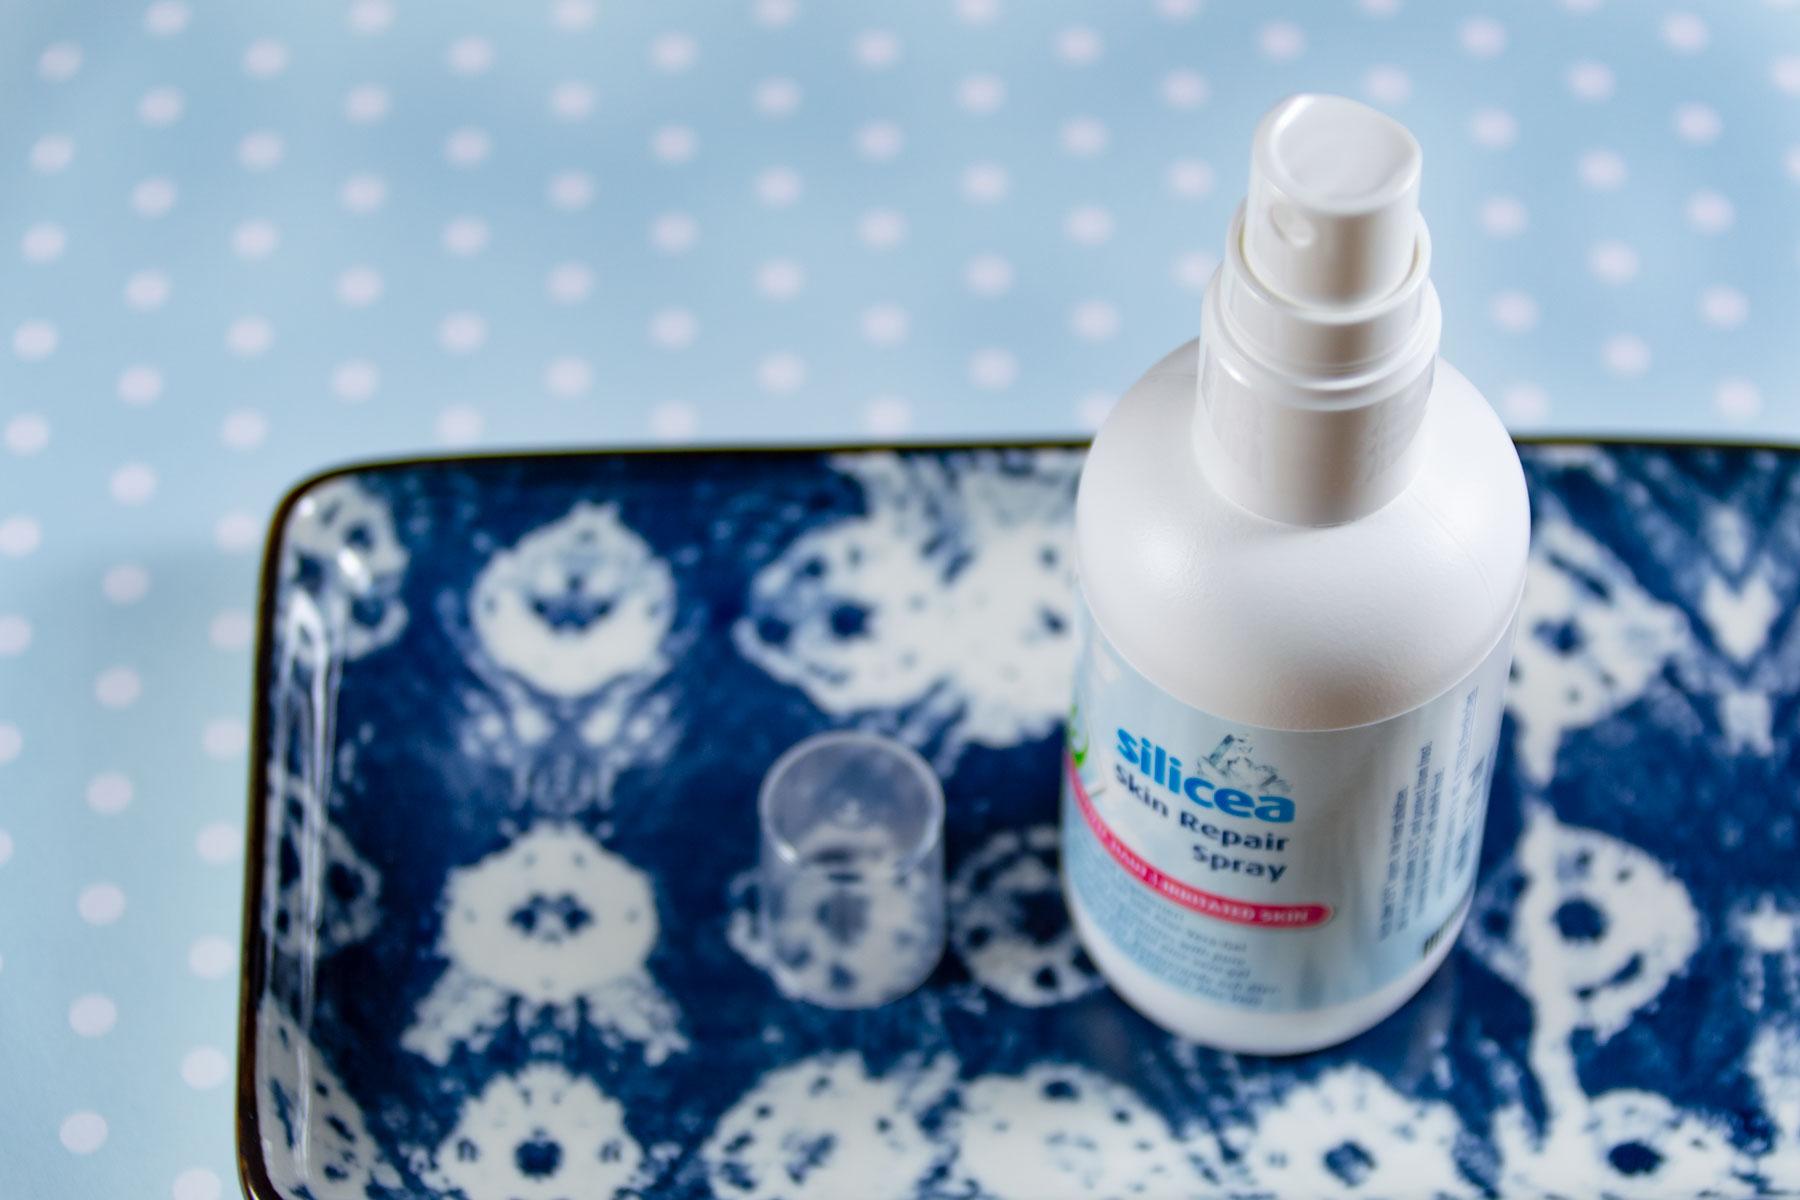 Silicea Skin Repair Spray